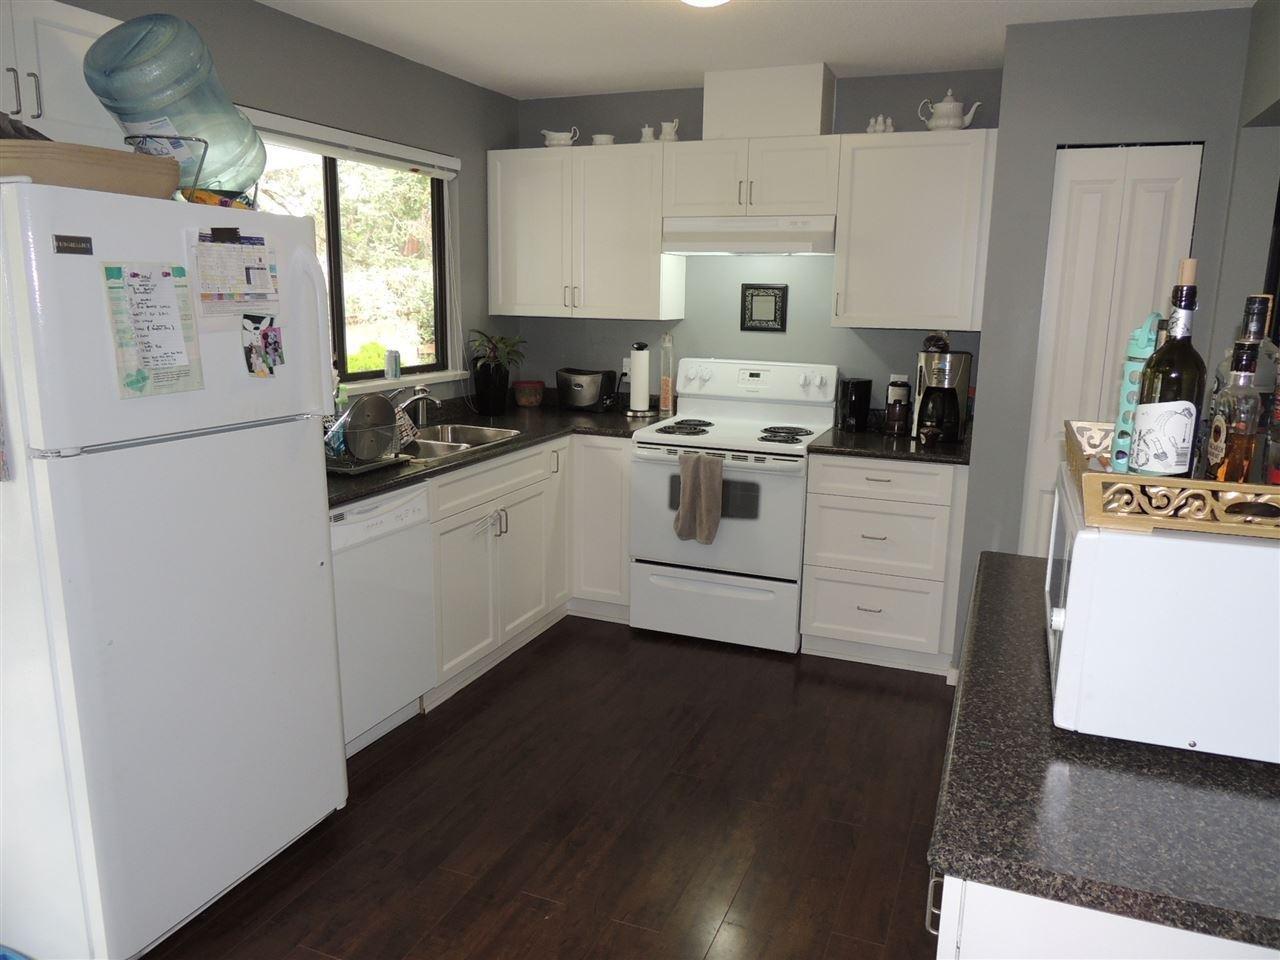 R2104142 - 5341 200A STREET, Langley City, Langley, BC - House/Single Family